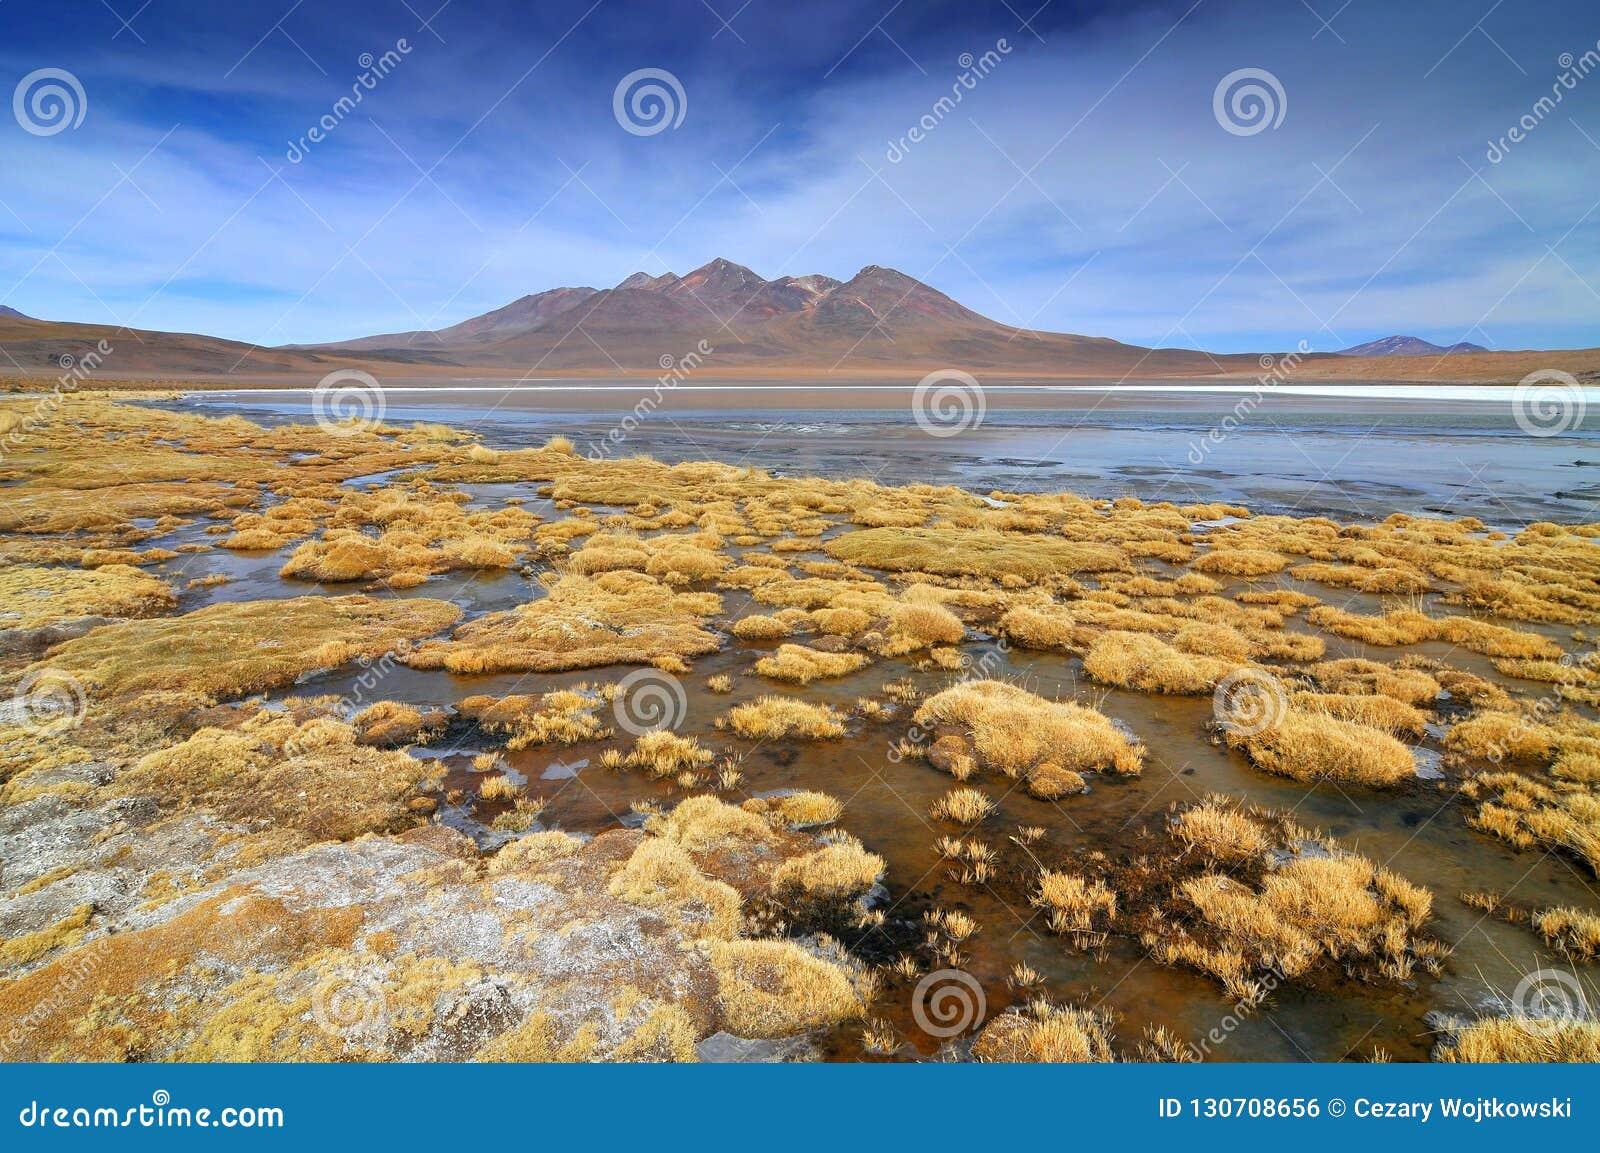 Боливия, озеро в провинции Sur Lipez, отдел Blanca Laguna Potosi